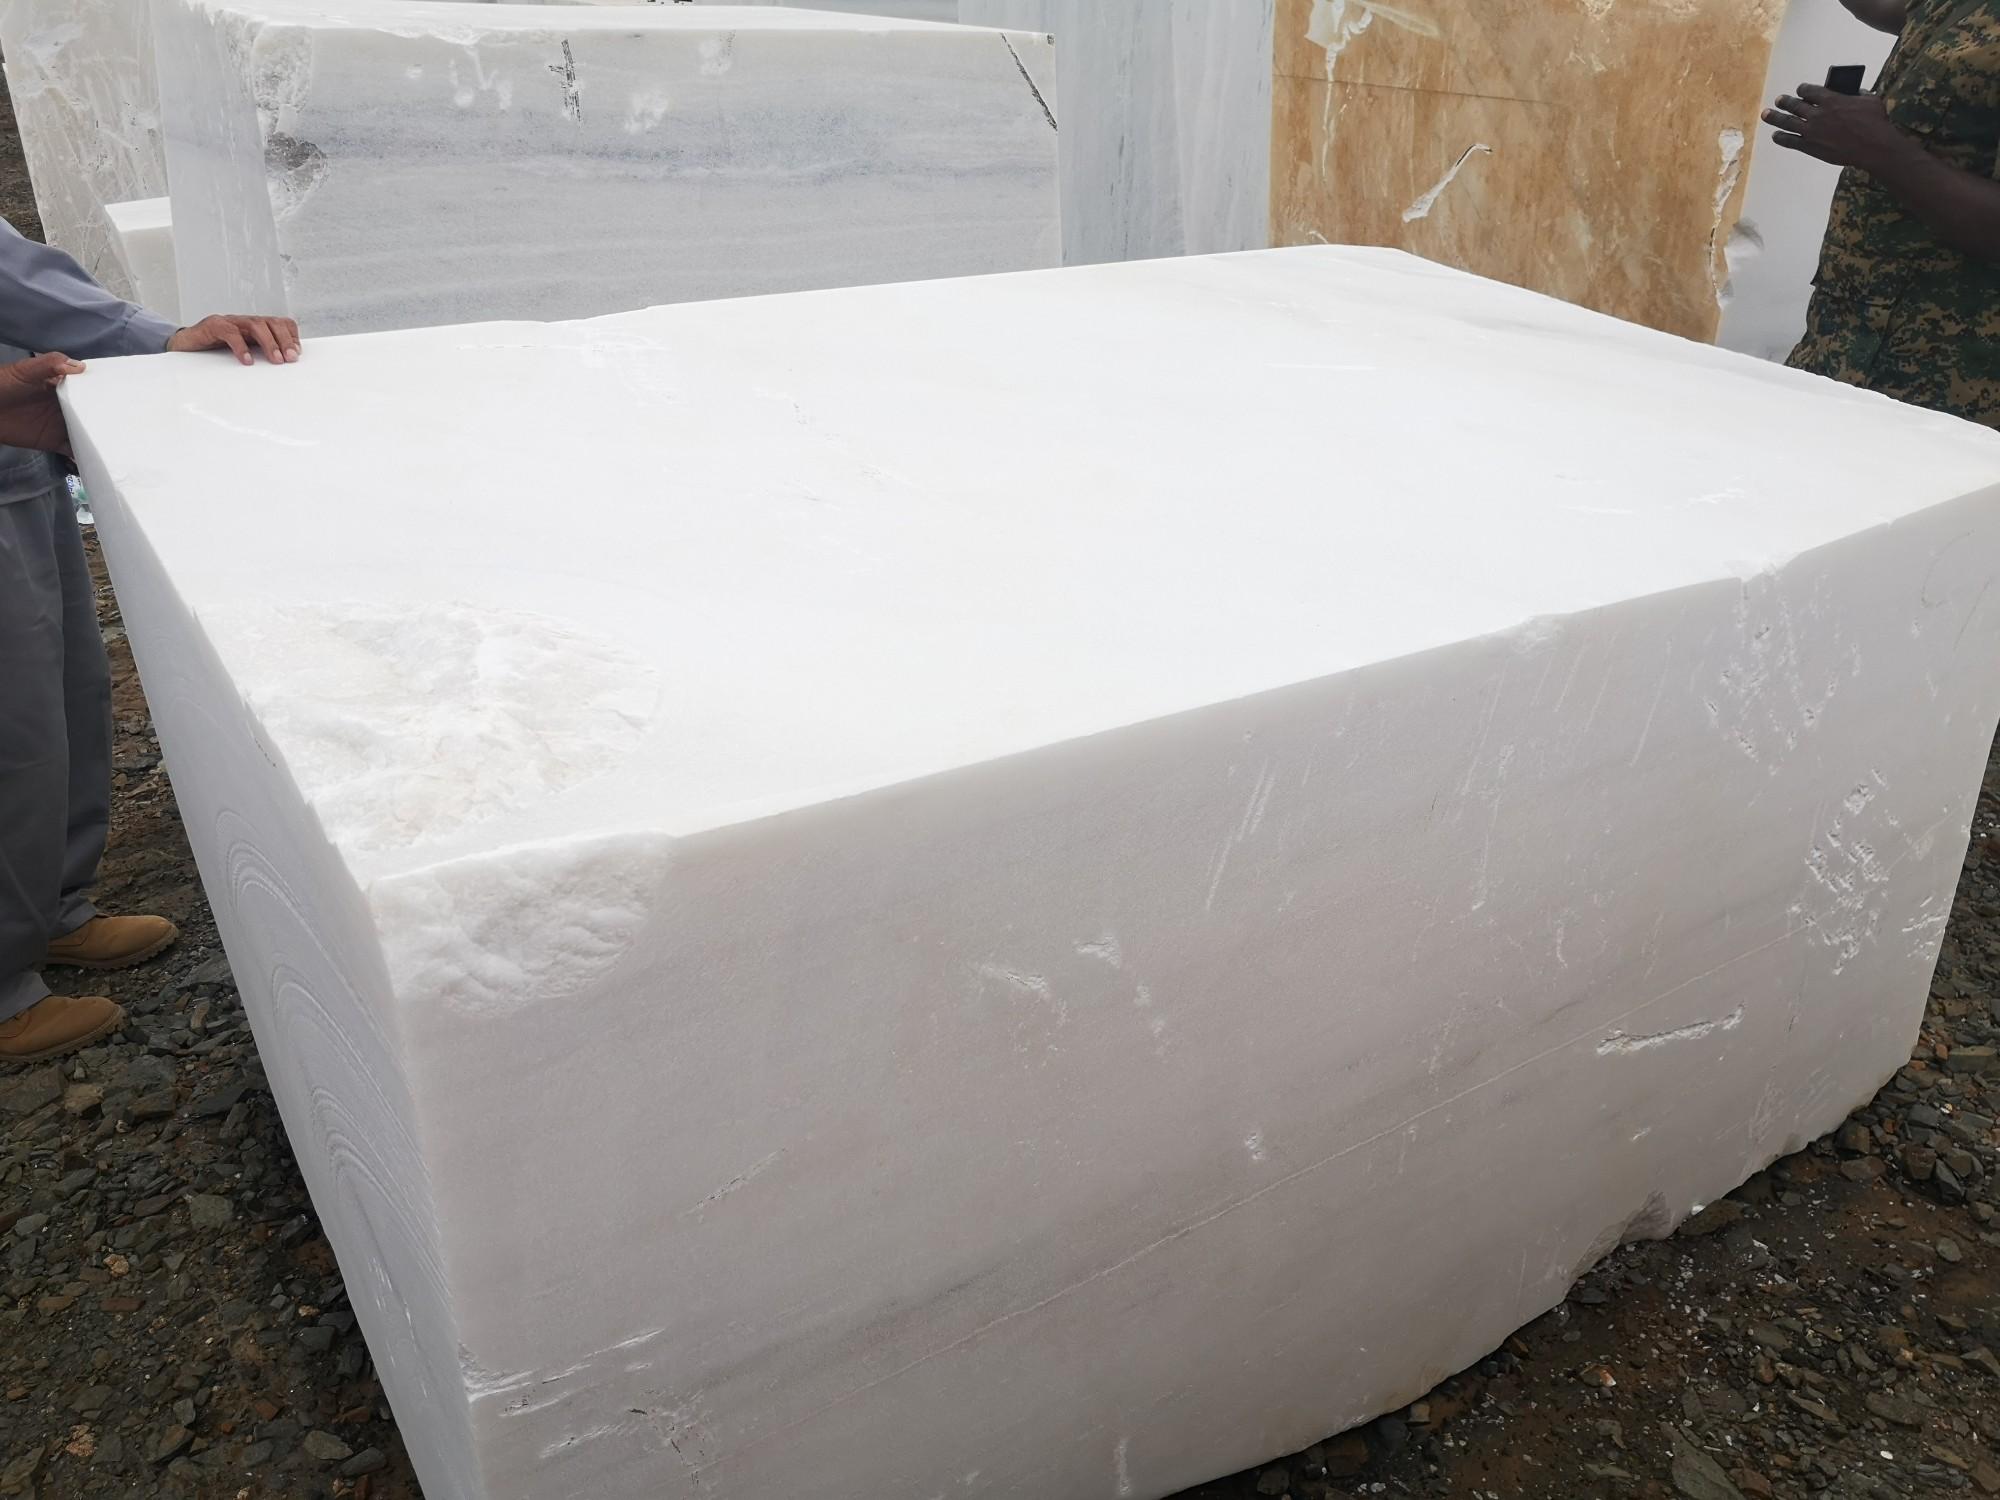 Membeli Marmar putih,Marmar putih Harga,Marmar putih Jenama,Marmar putih  Pengeluar,Marmar putih Petikan,Marmar putih syarikat,